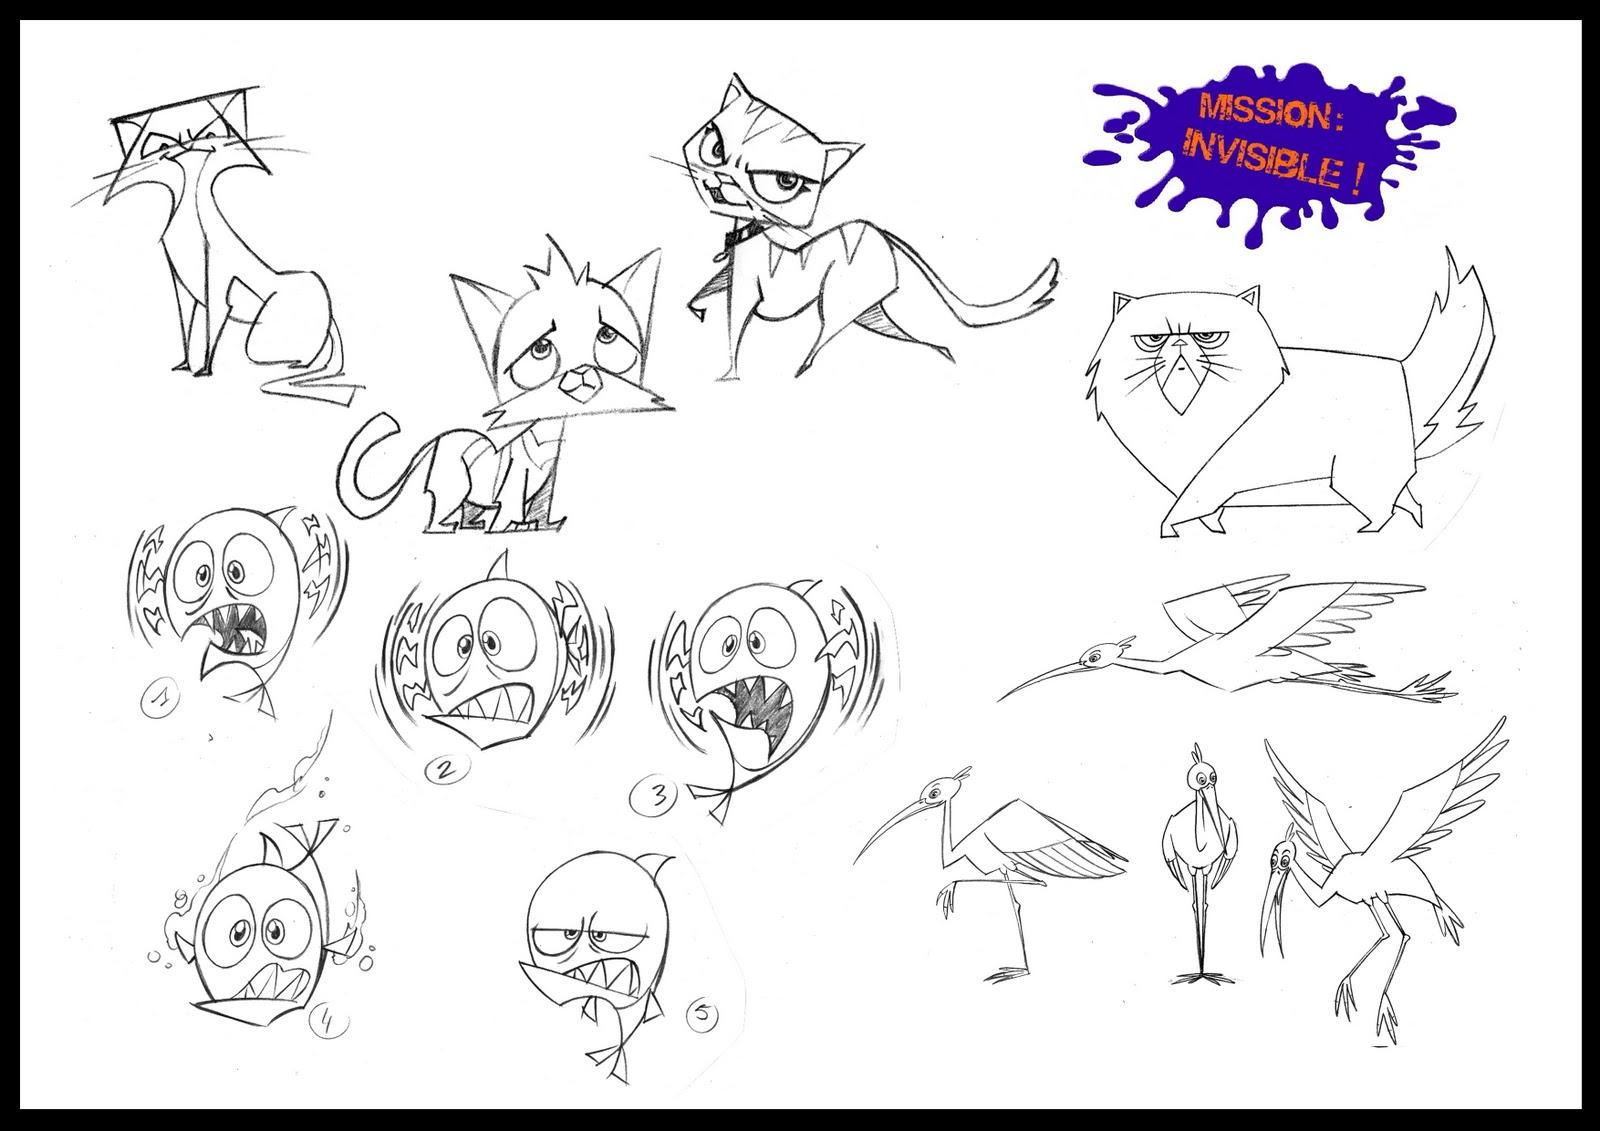 Character design sur la s rie mission invisible chez samka productions - Mission invisible ...